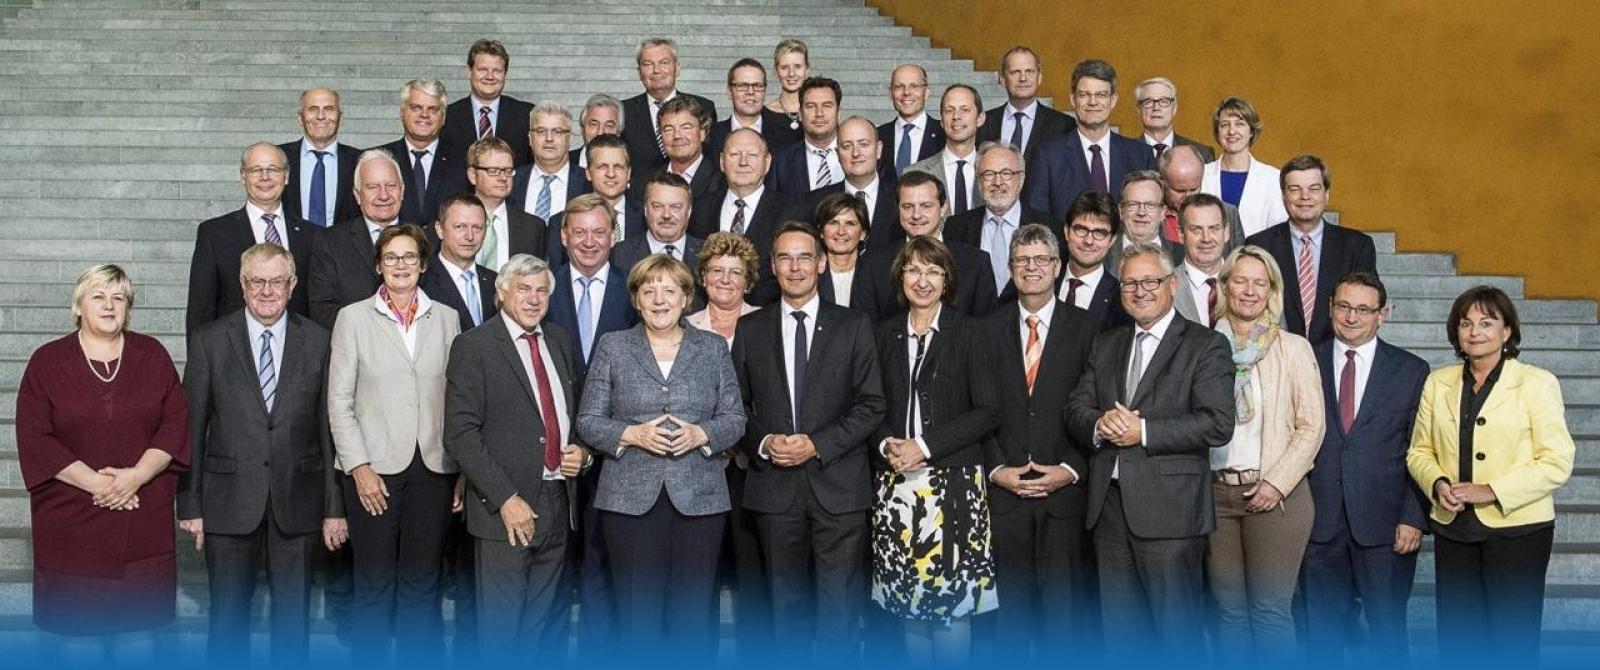 oliver-grundmann-stade-rotenburg-politiker-cdu-berlin-bundestag-mdb (55)